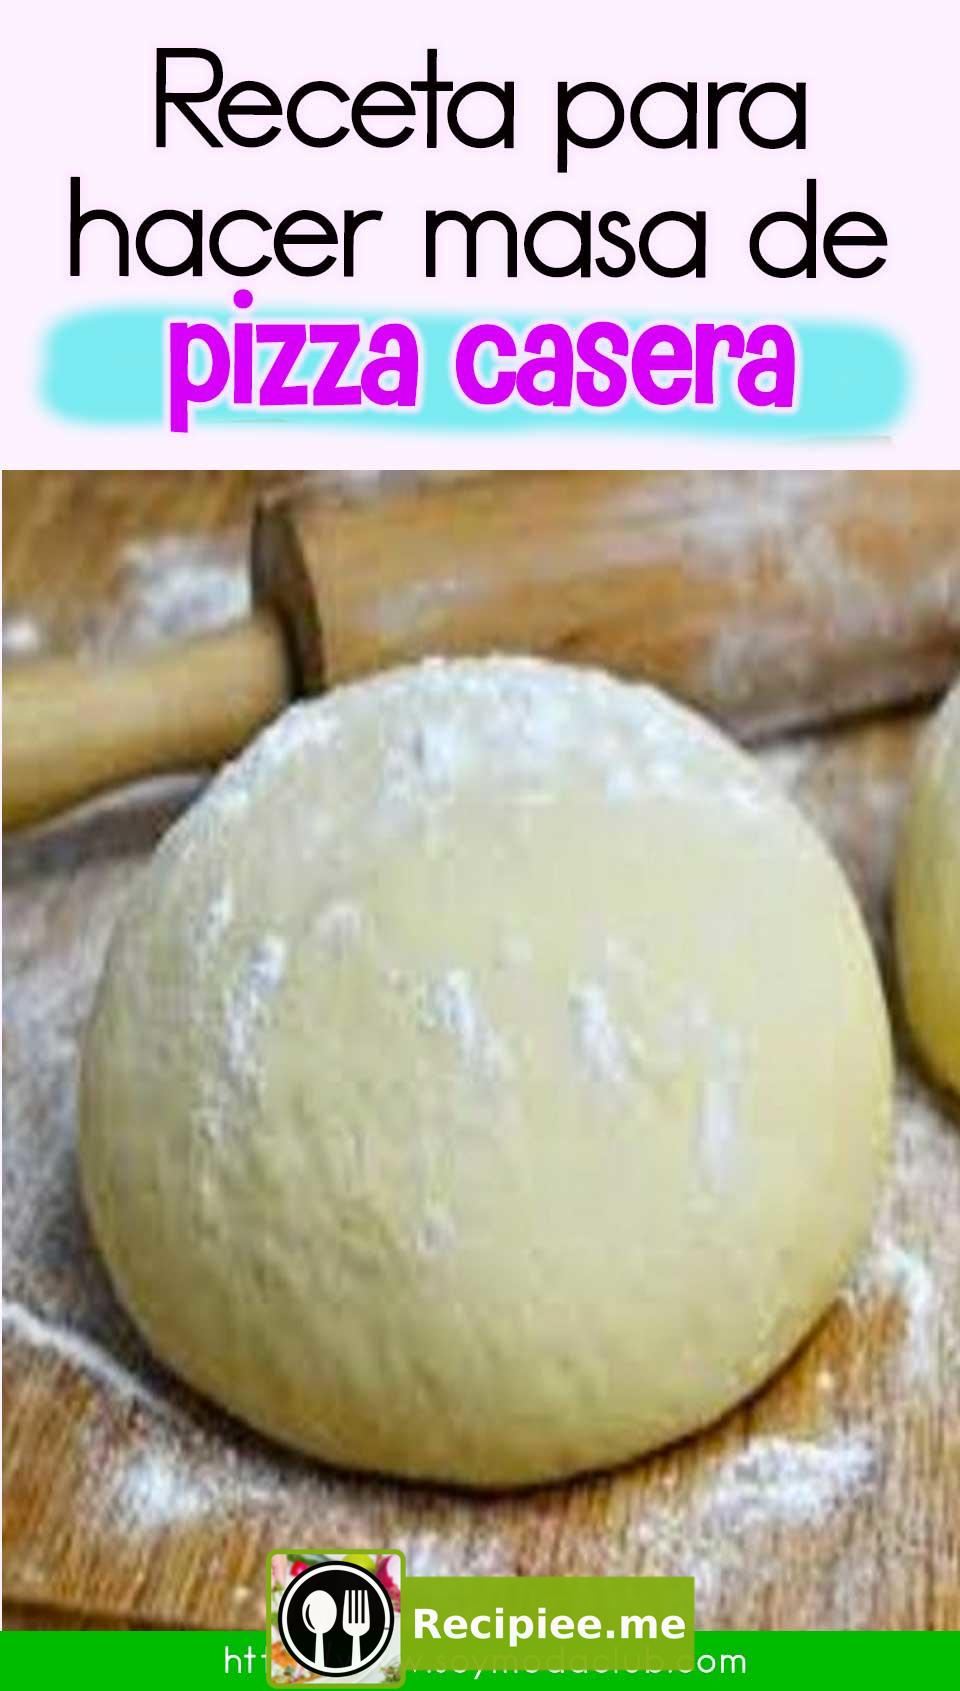 Receta Para Hacer Masa De Pizza Casera En 2020 Masa De Pizza Casera Pizza Casera Masa Para Pizza